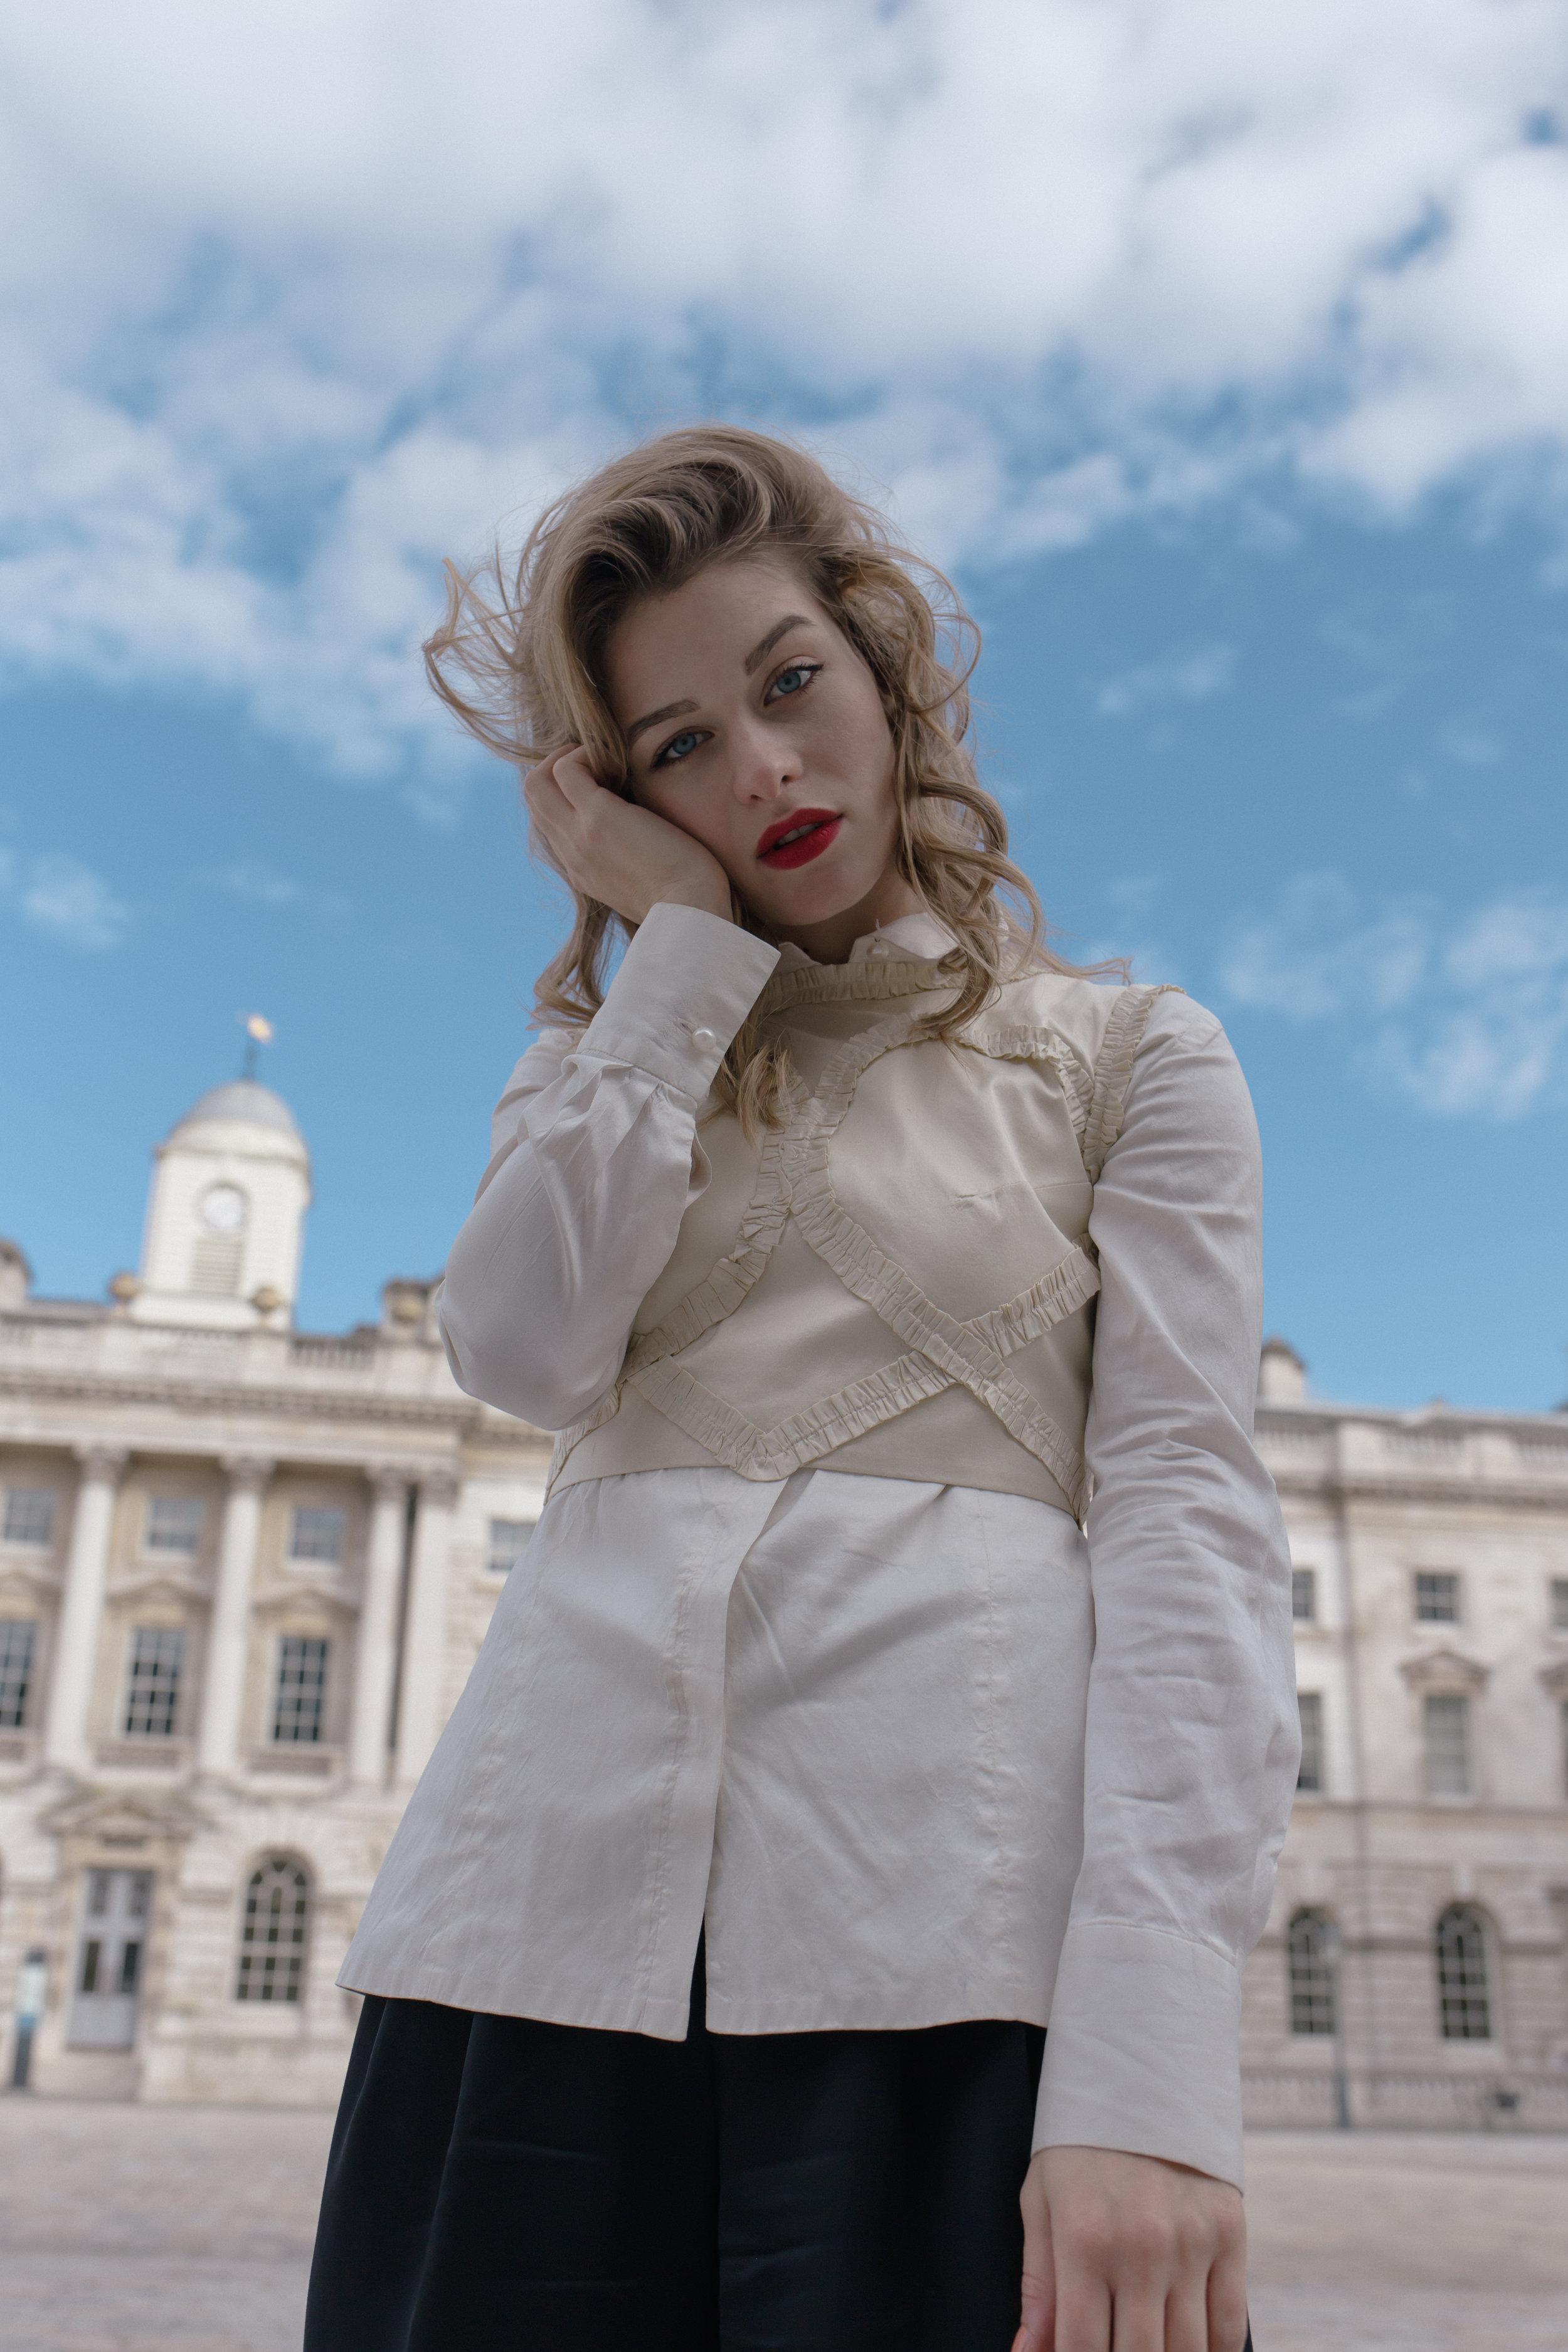 Vjosa  in  Doruntina's  Love Collection  London '17